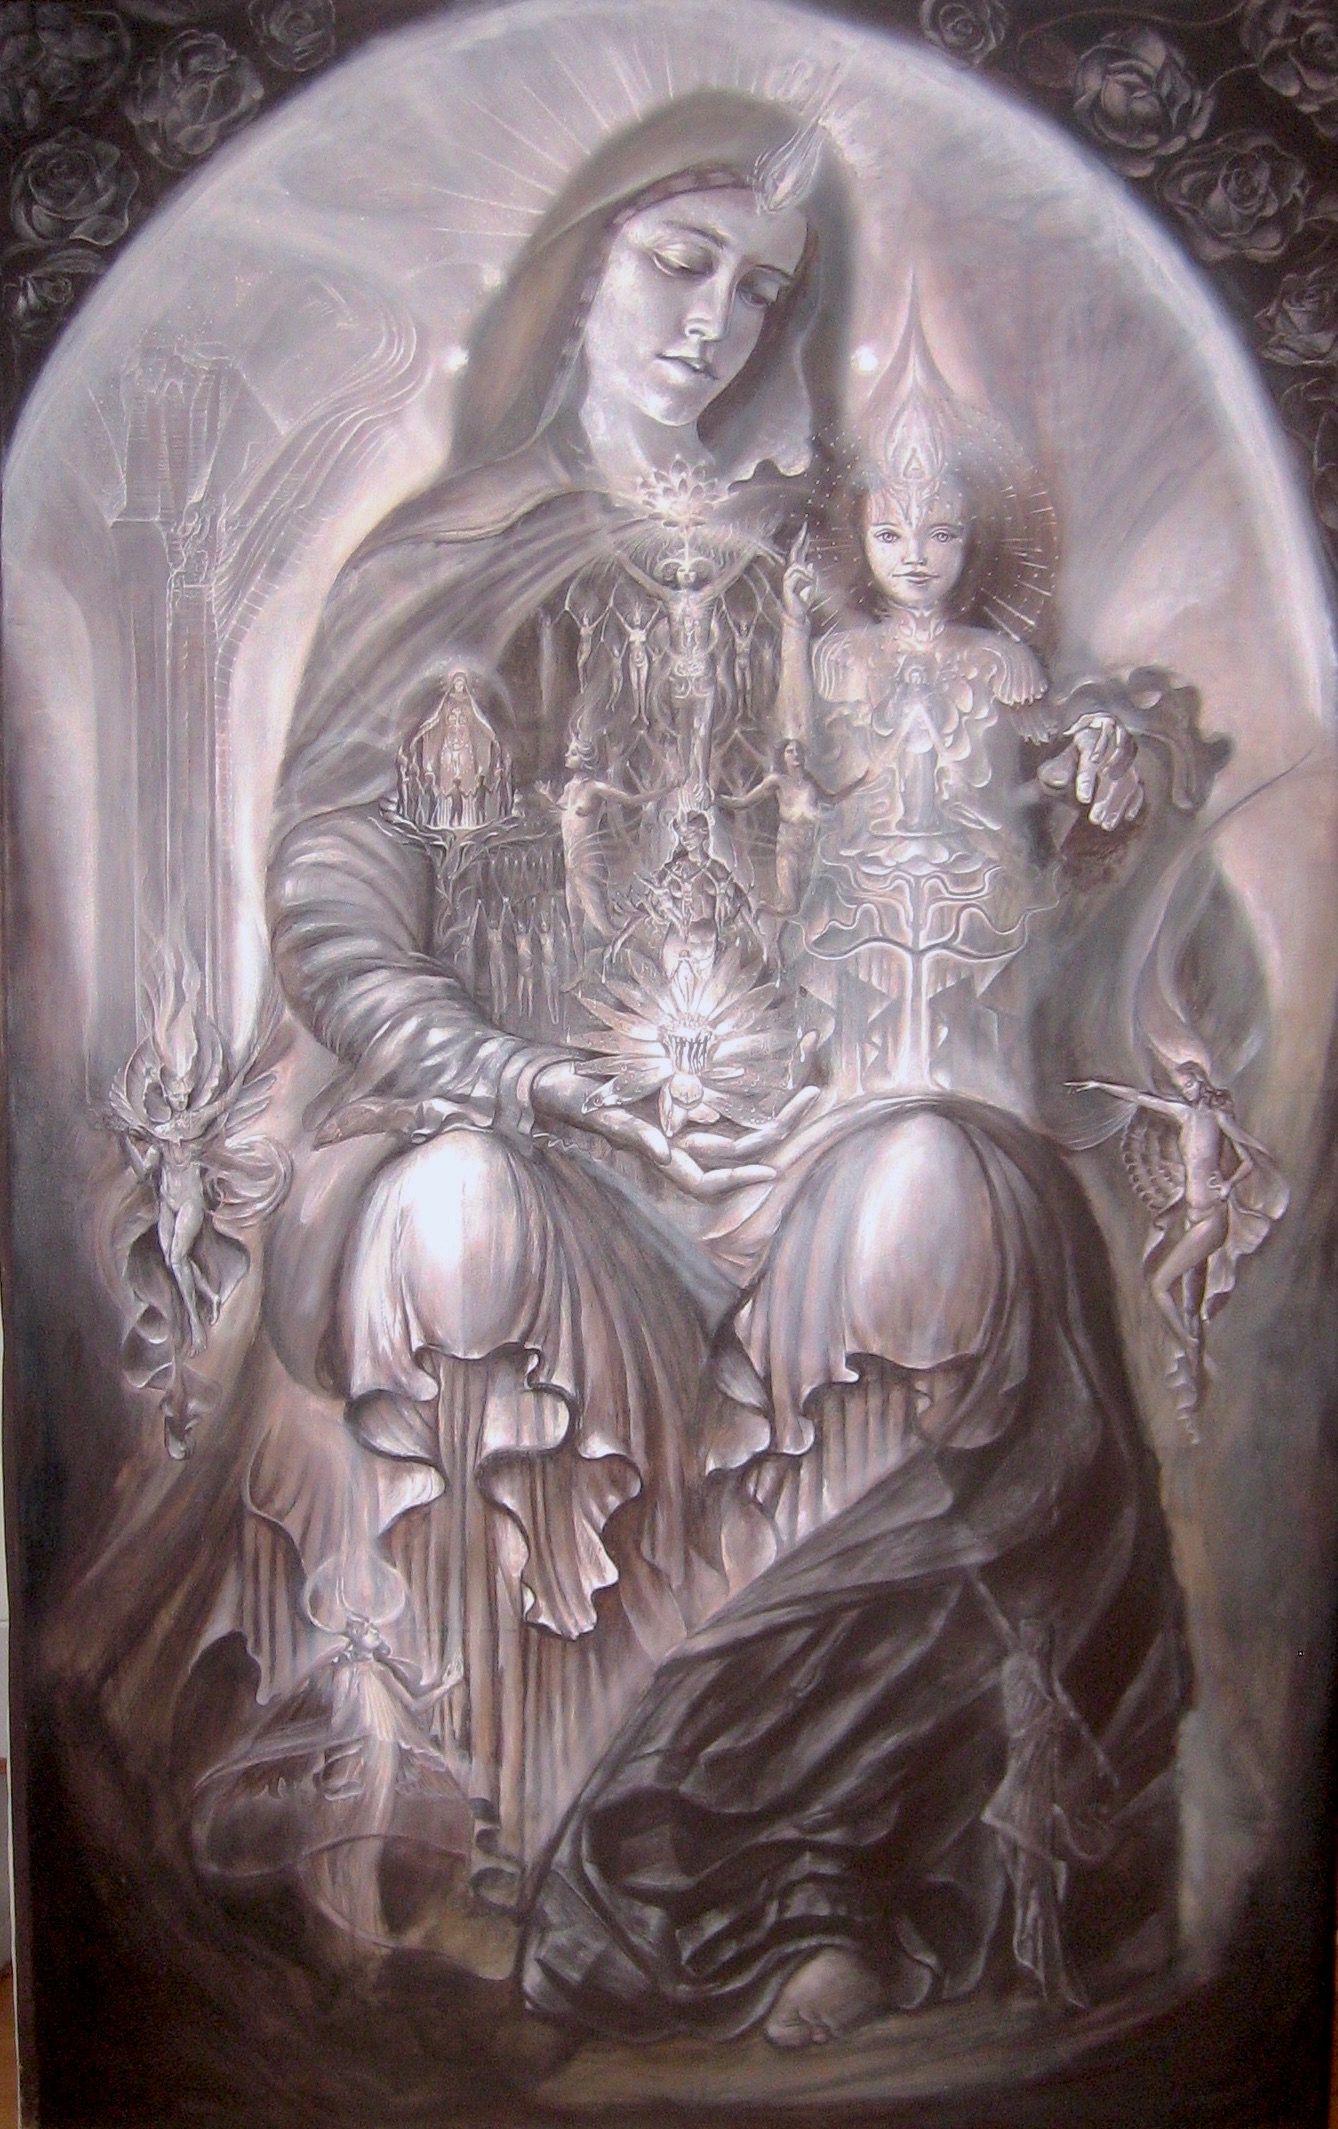 'Divine Mother' Kuba Ambrose - oil & egg tempera on canvas #visionaryart #sacredart